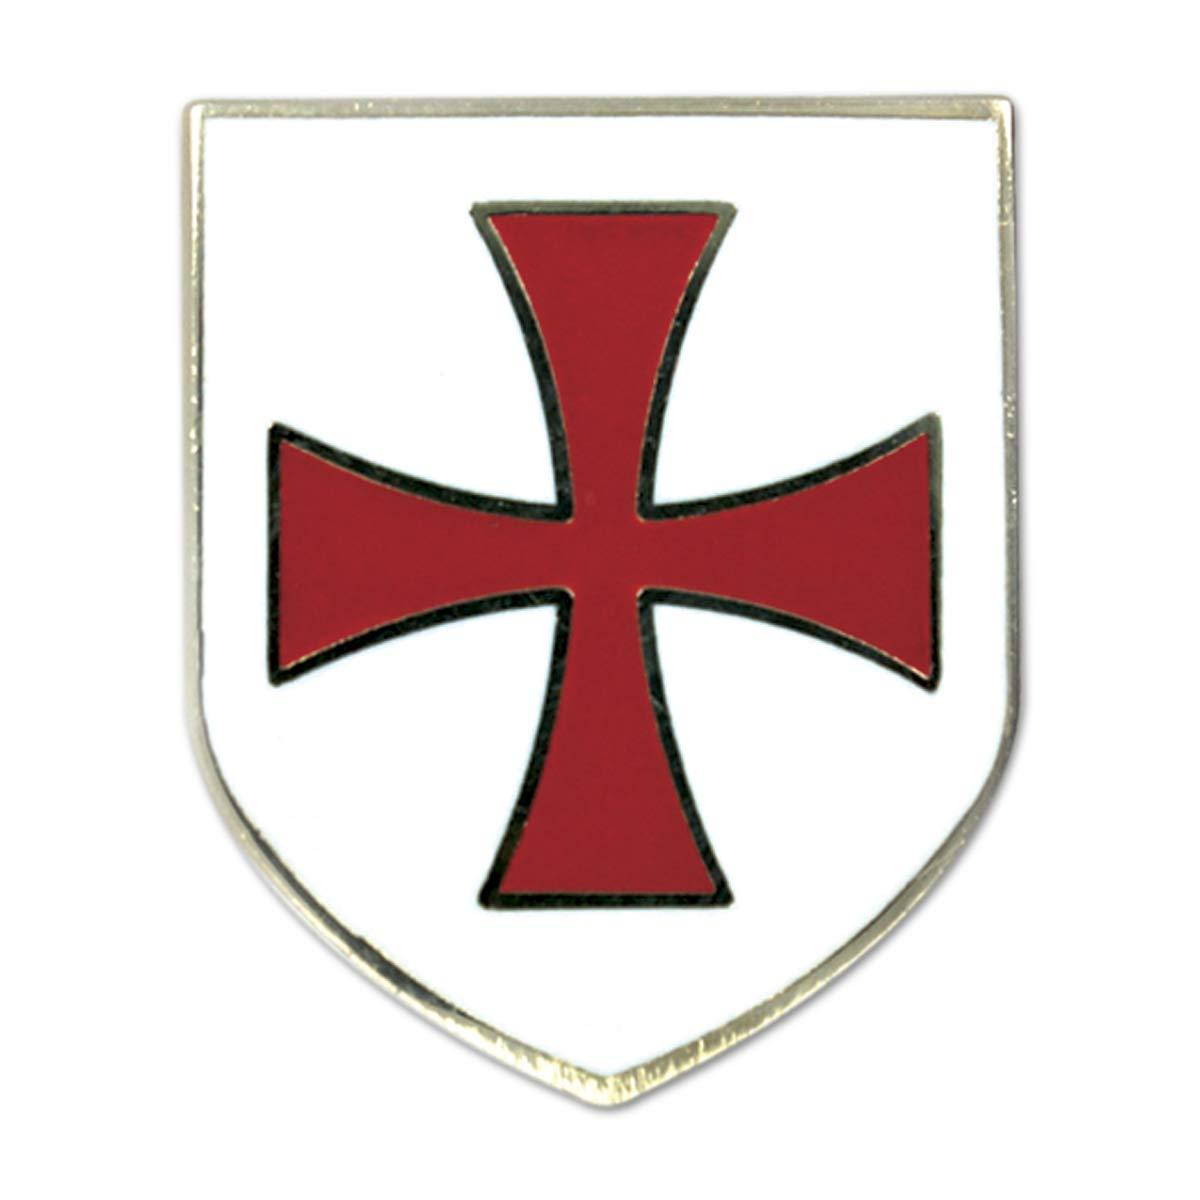 Knights Templar Crusader Red Cross White Shield Freemasonic Lapel Pin.